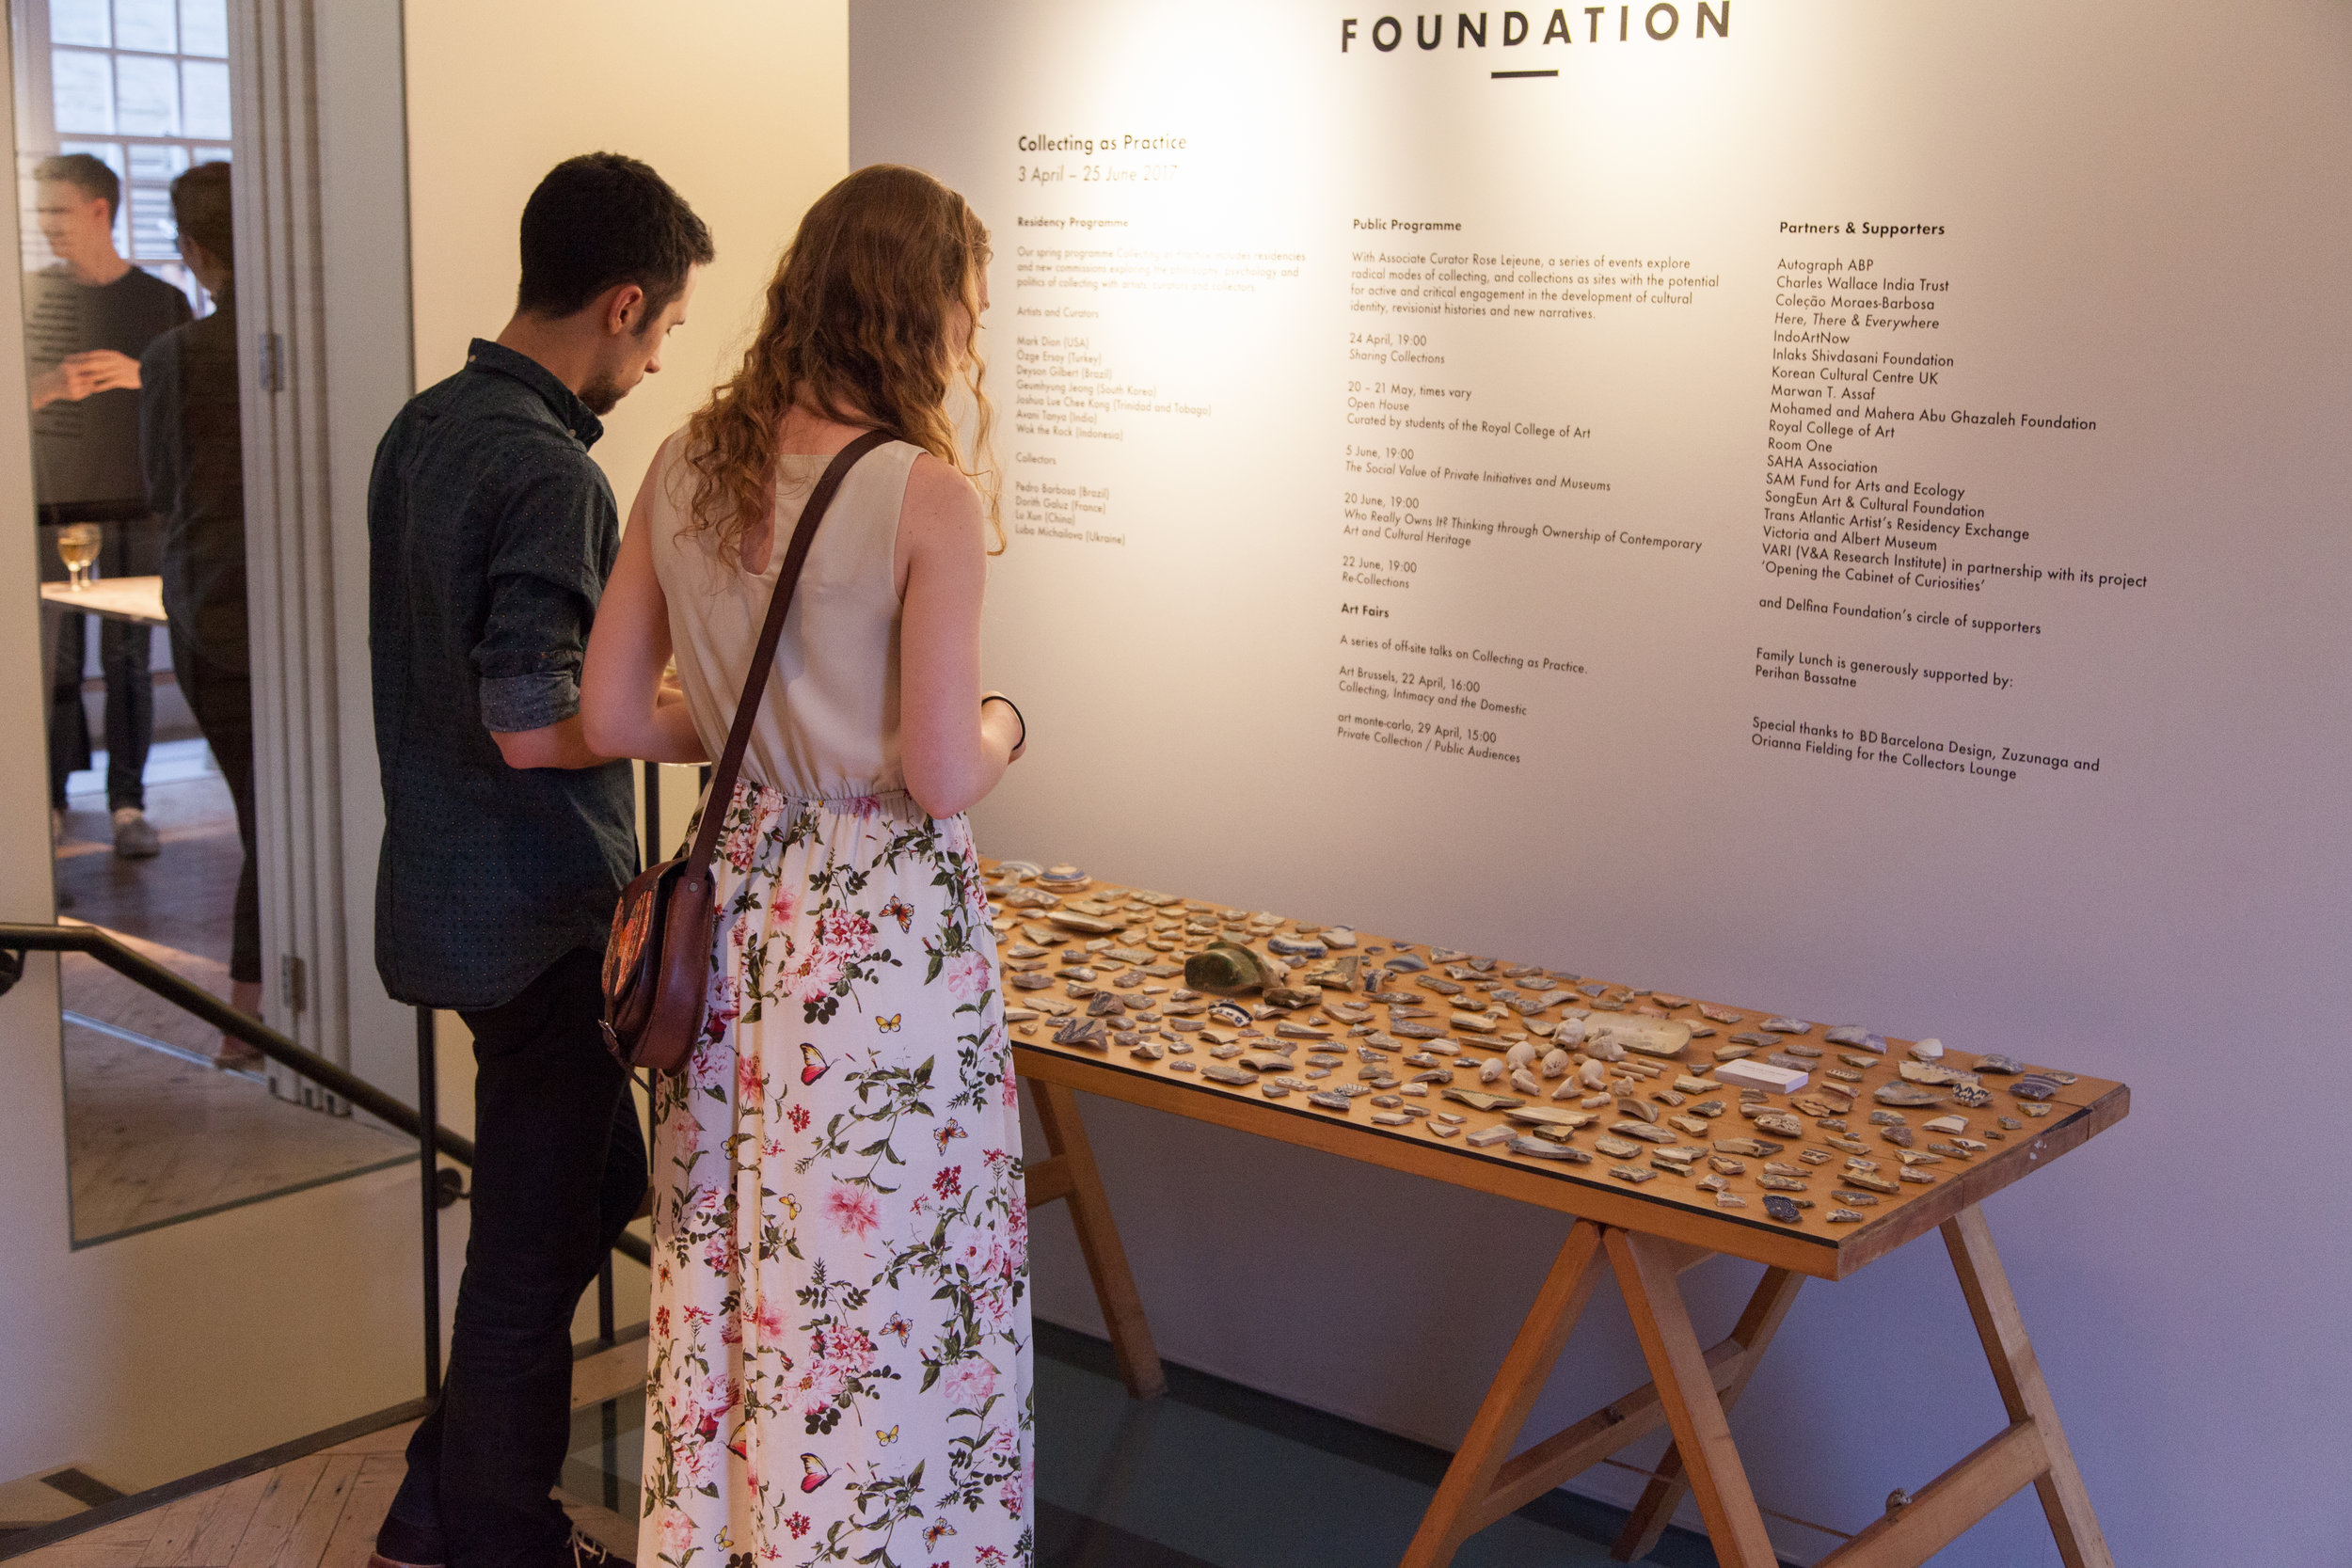 Shards display,Delfina Foundation, Victoria, London, 2017. Photo: Christian Lübbert